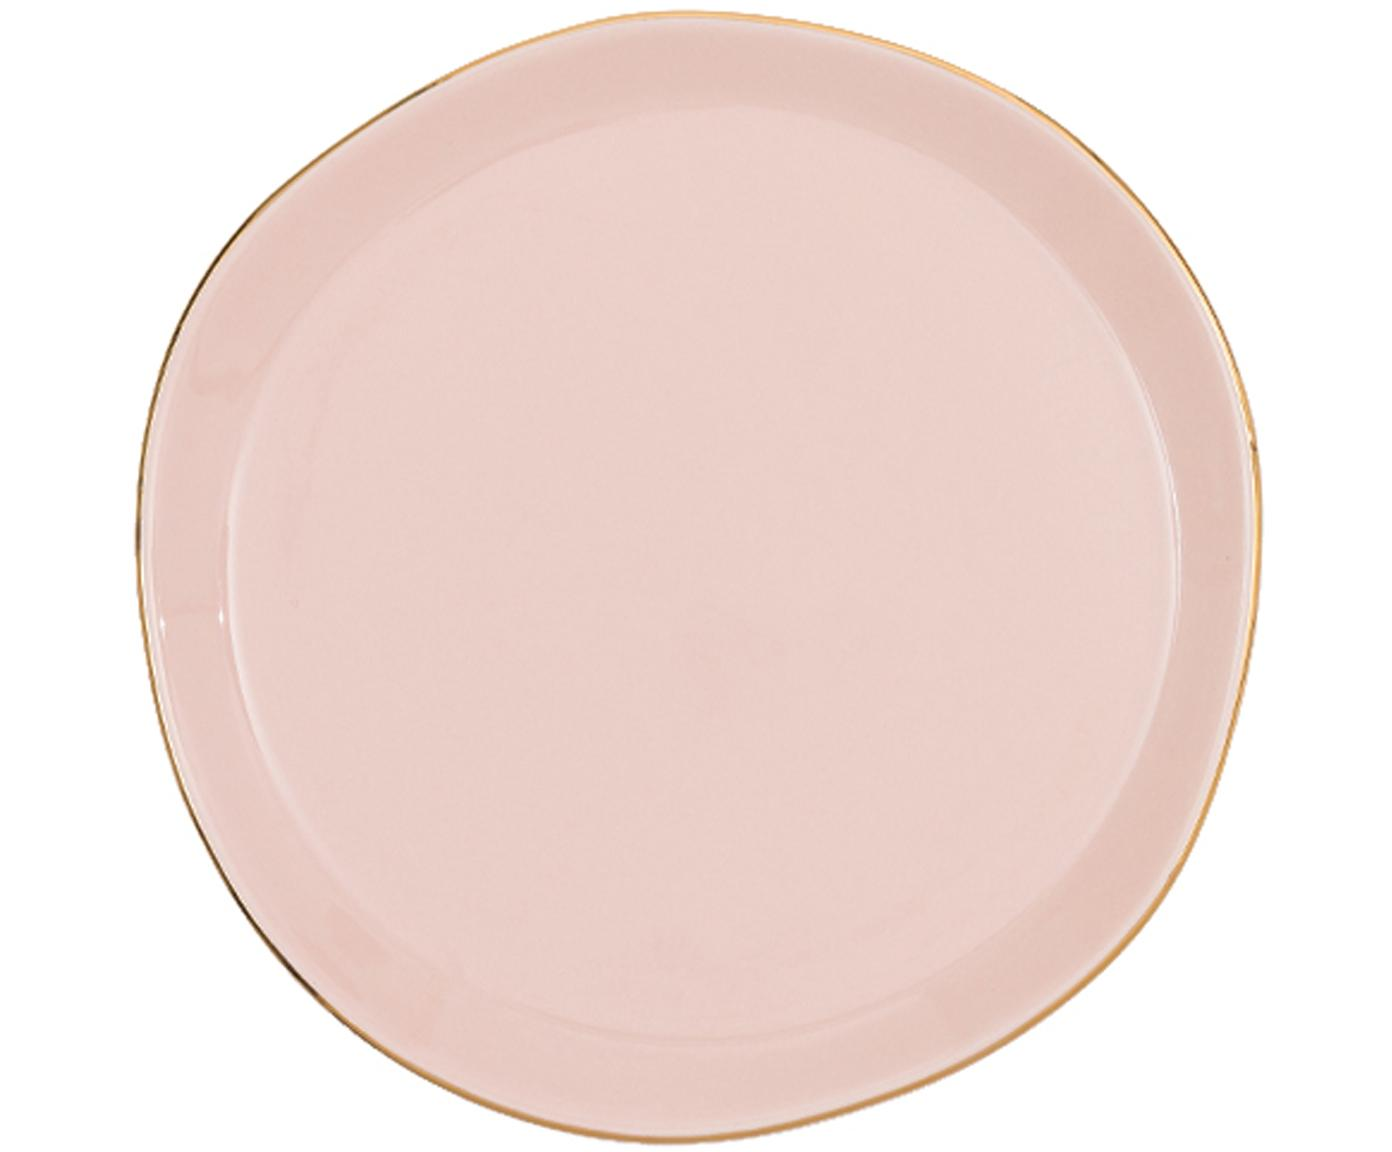 Ontbijtbord Good Morning, Porselein, Roze, goudkleurig, Ø 17 cm